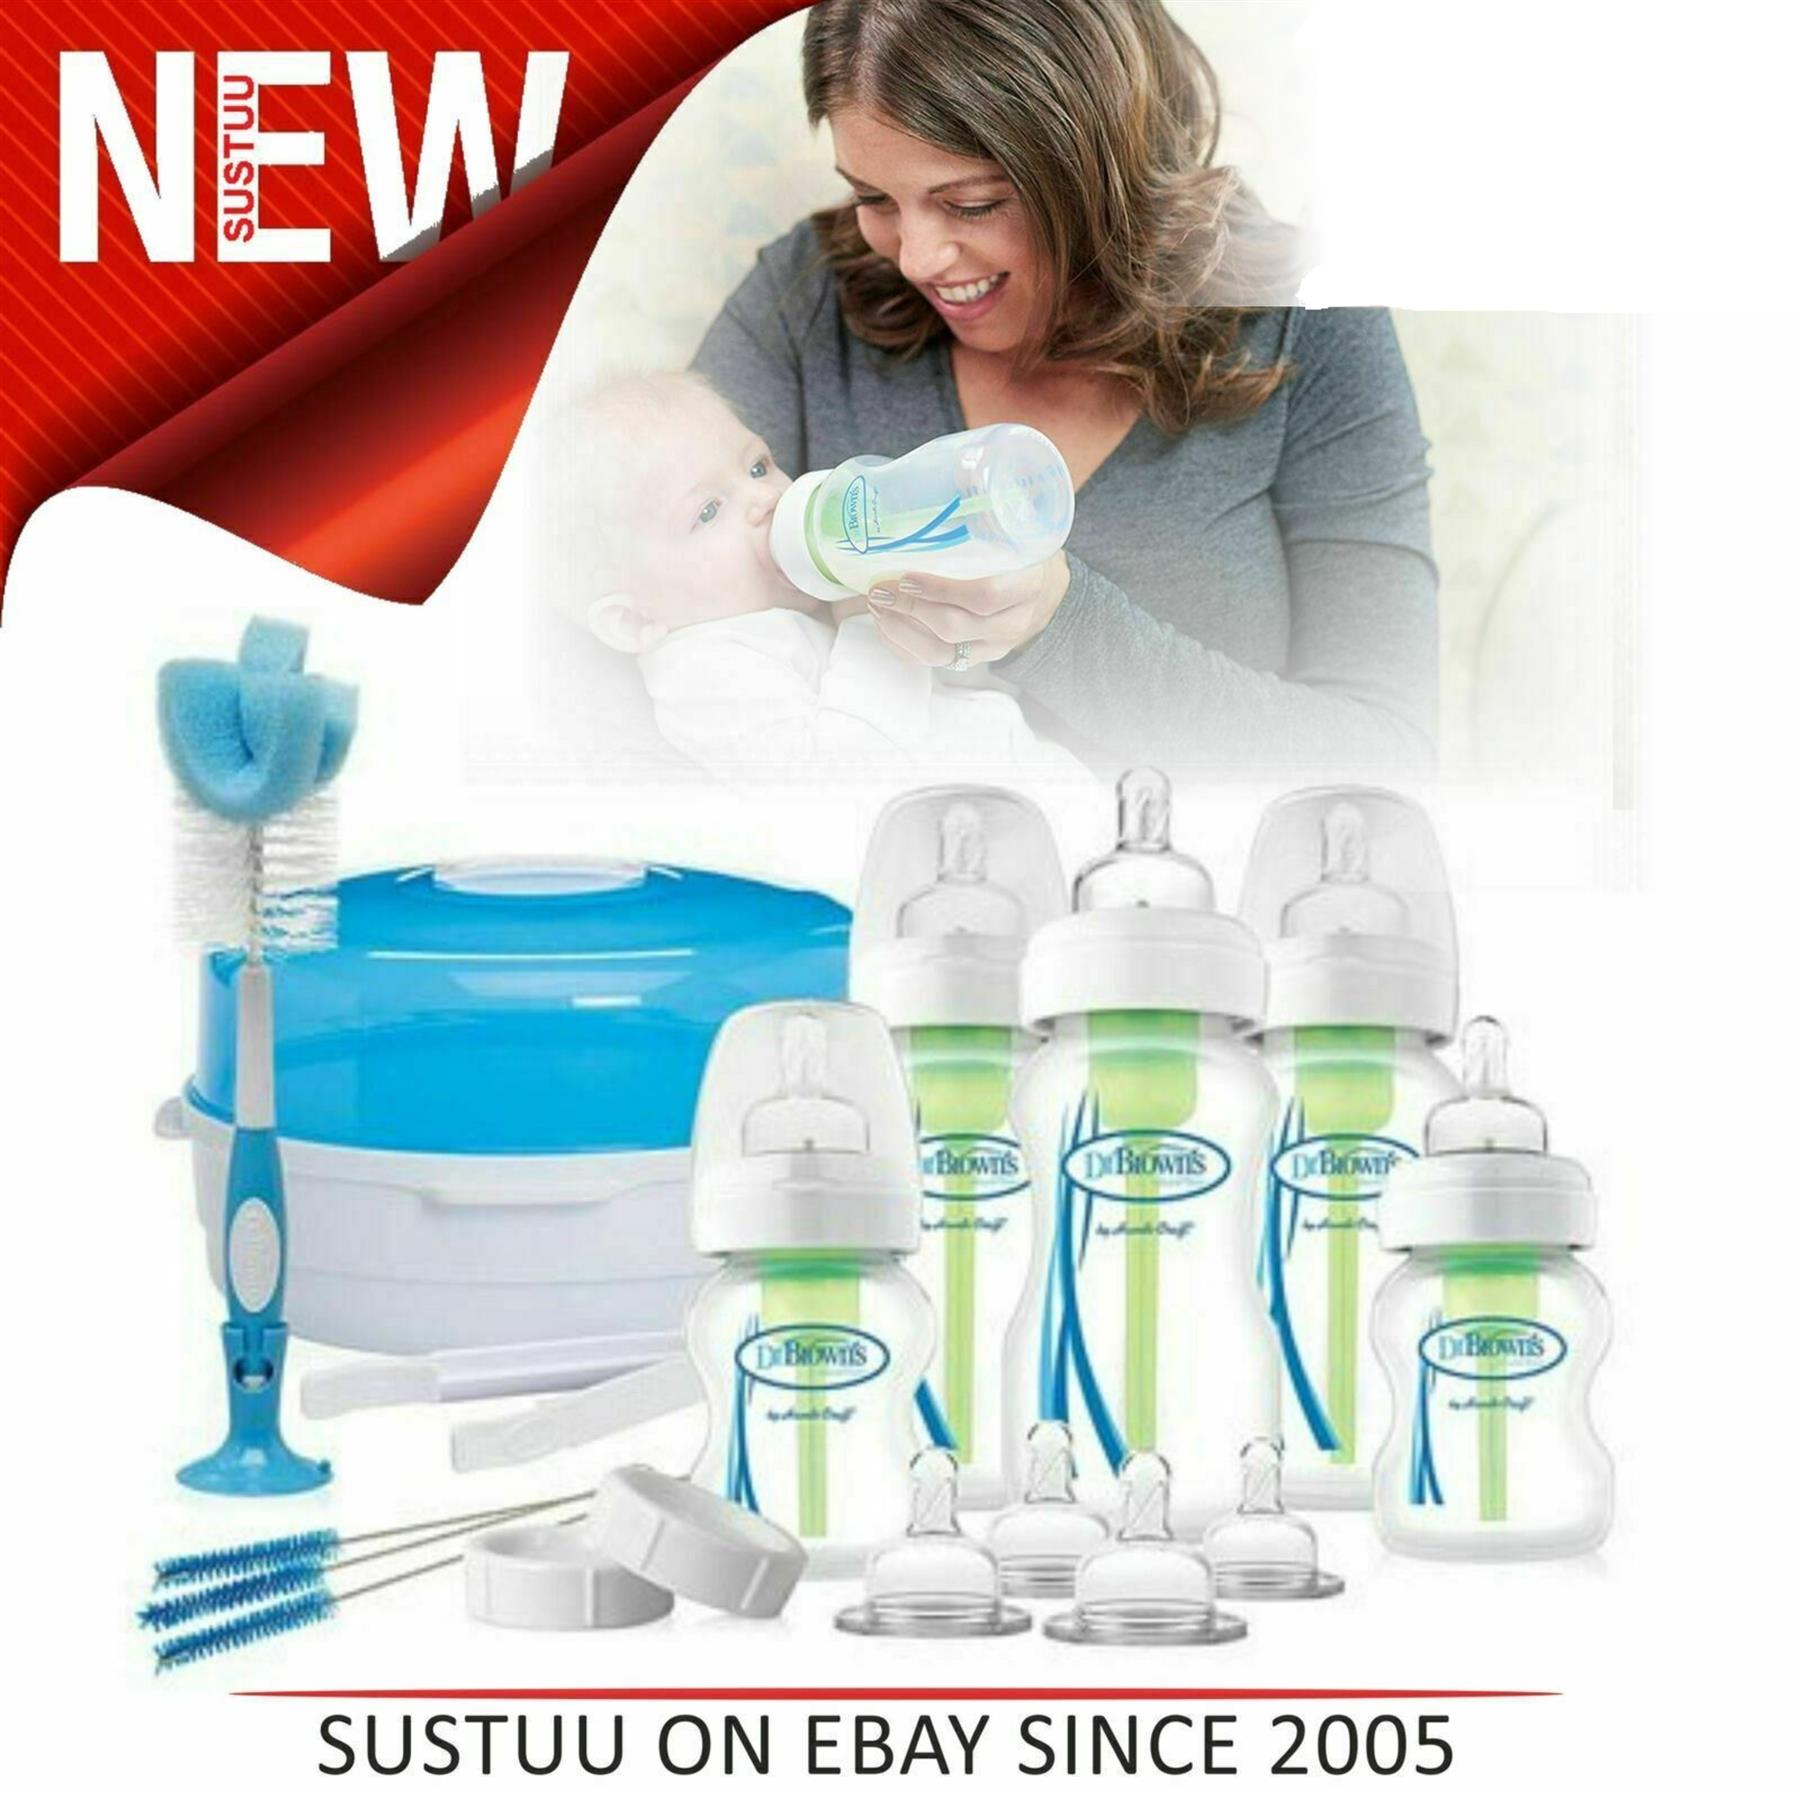 Dr Browns Options Bottle /& Steriliser Newborn Gift Set│Reduce Colic,Burping,Wind